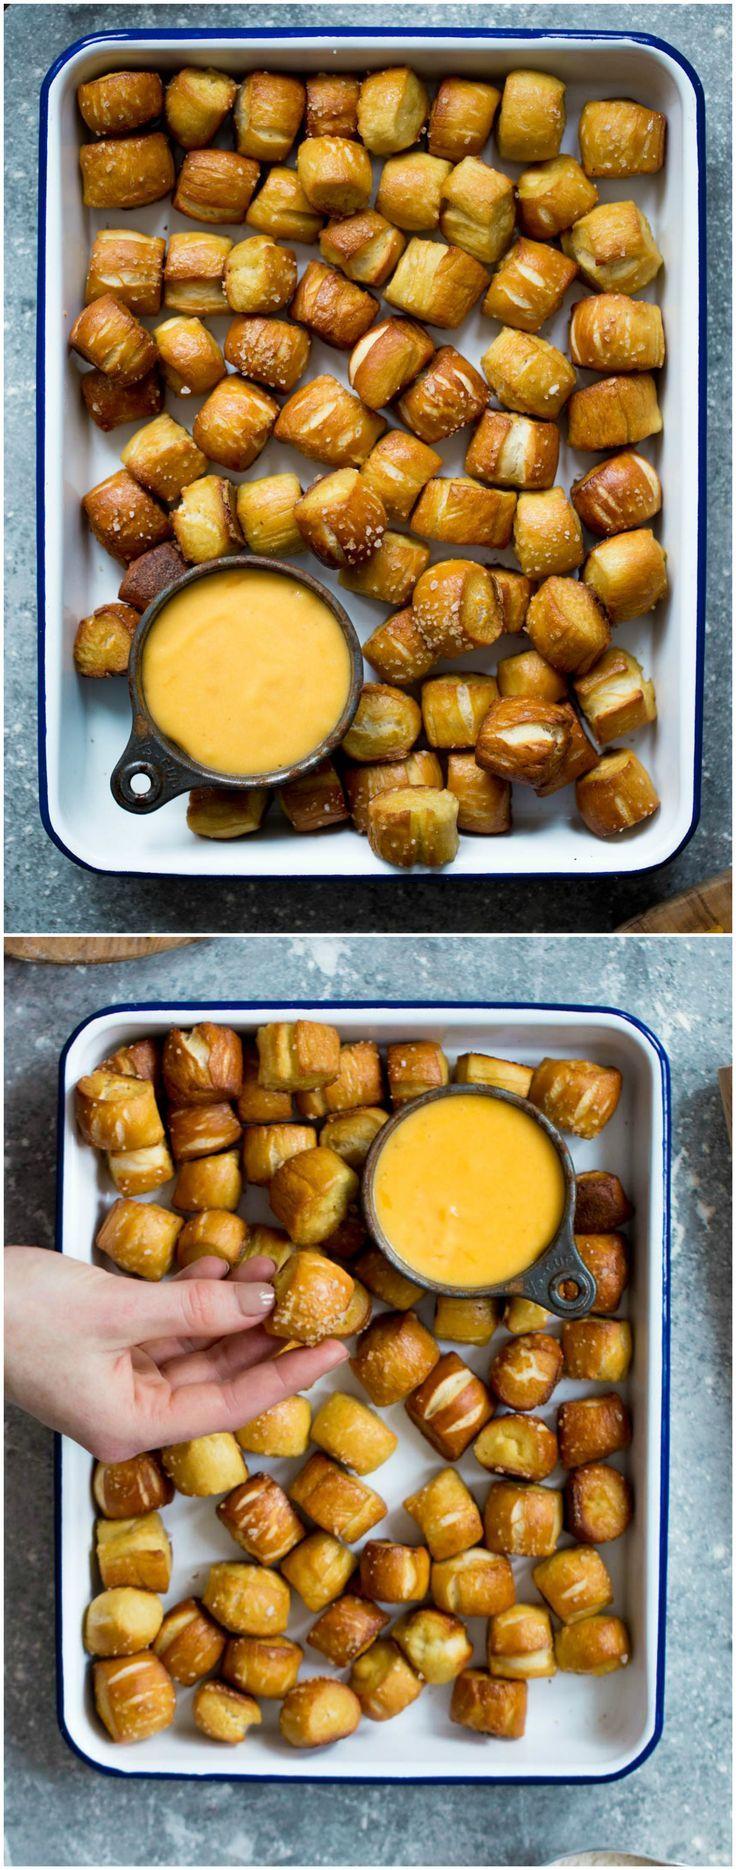 Best 25+ Soft foods ideas on Pinterest | Apple, Loaf ...